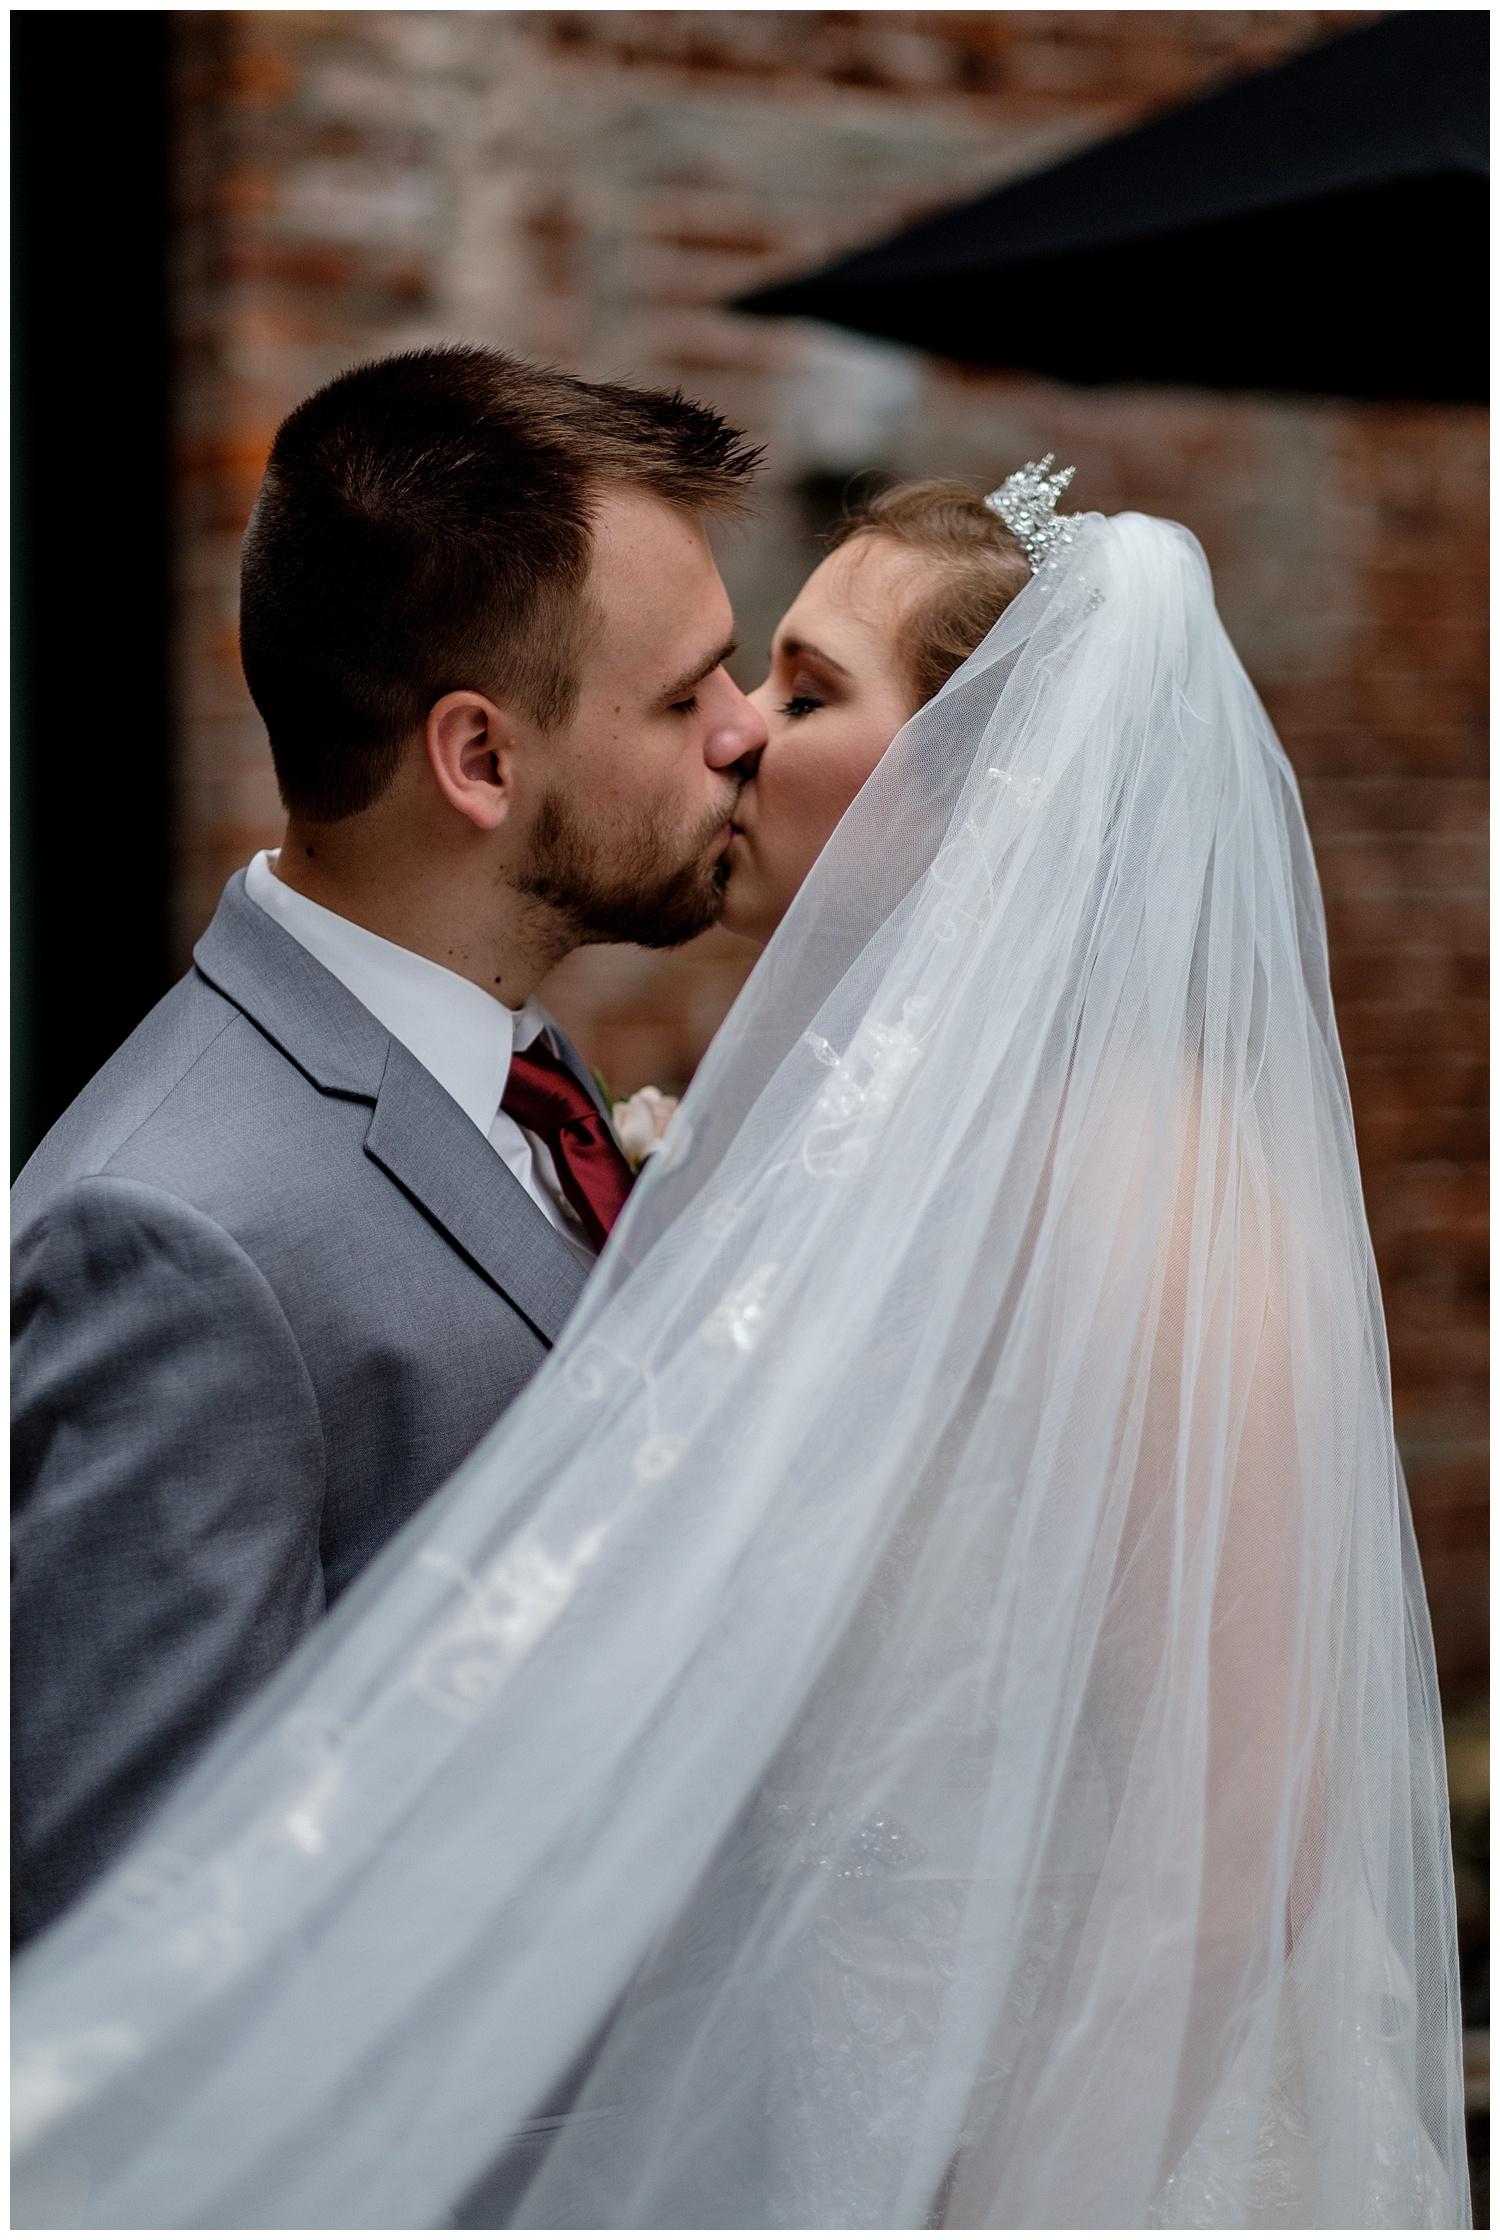 TheSmythCollective-Best-Cincinnati-Wedding-Photographer-Urban-Downtown-Covington-Wedding-24.jpg